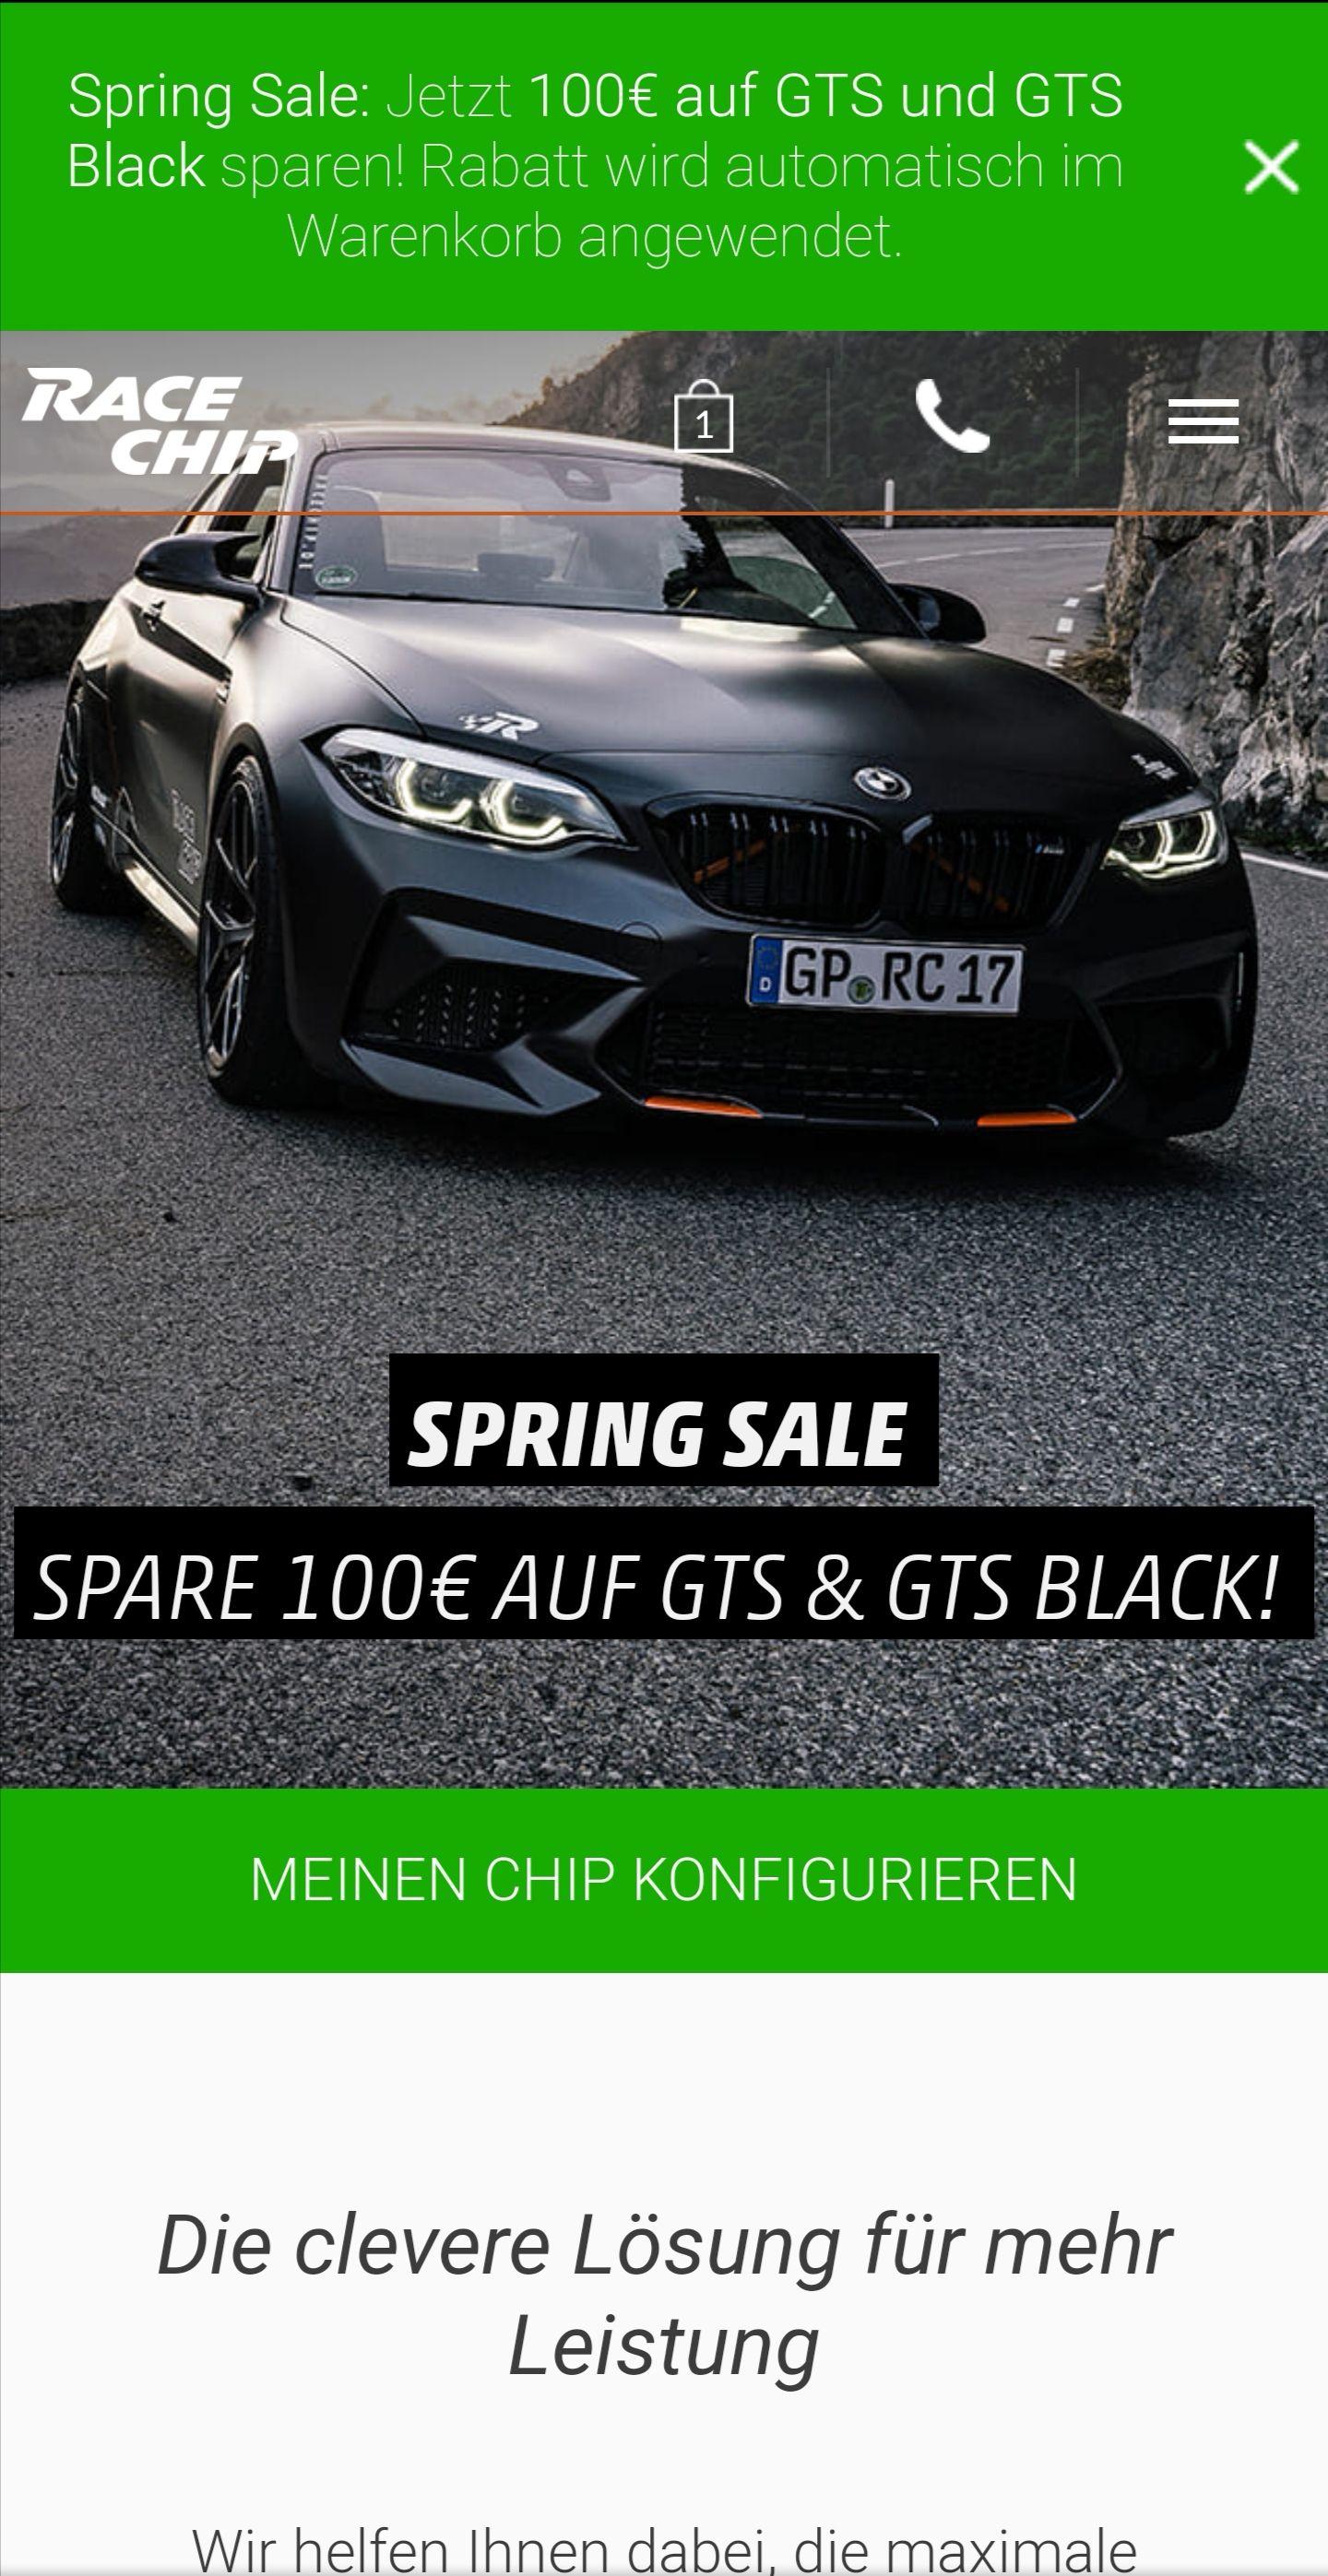 Racechip Springsale - 100€ Rabatt auf GTS & GTS Black